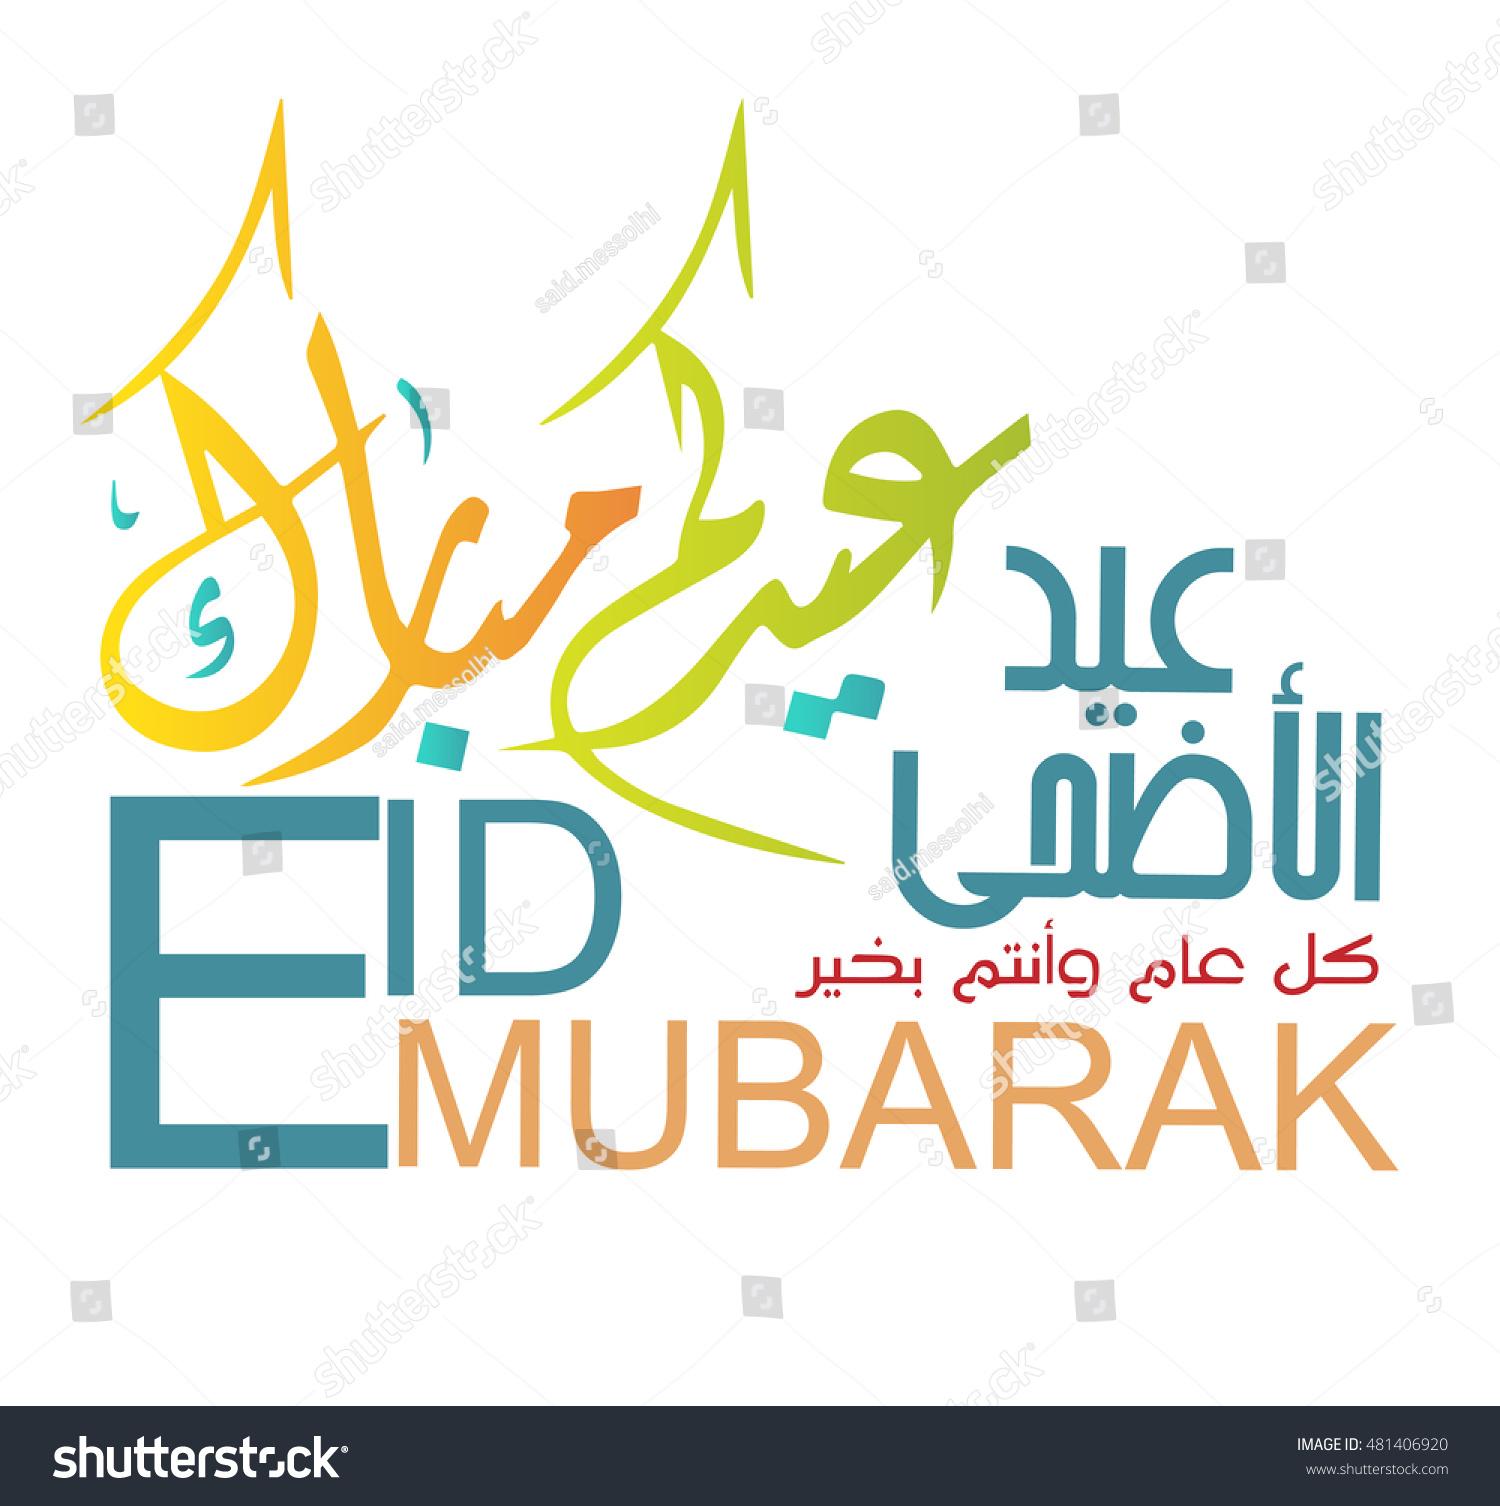 Must see Eid Holiday Eid Al-Fitr Greeting - stock-vector-greeting-card-of-eid-al-fitr-and-eid-al-adha-mubarak-holiday-for-muslim-community-with-arabic-481406920  Graphic_592498 .jpg